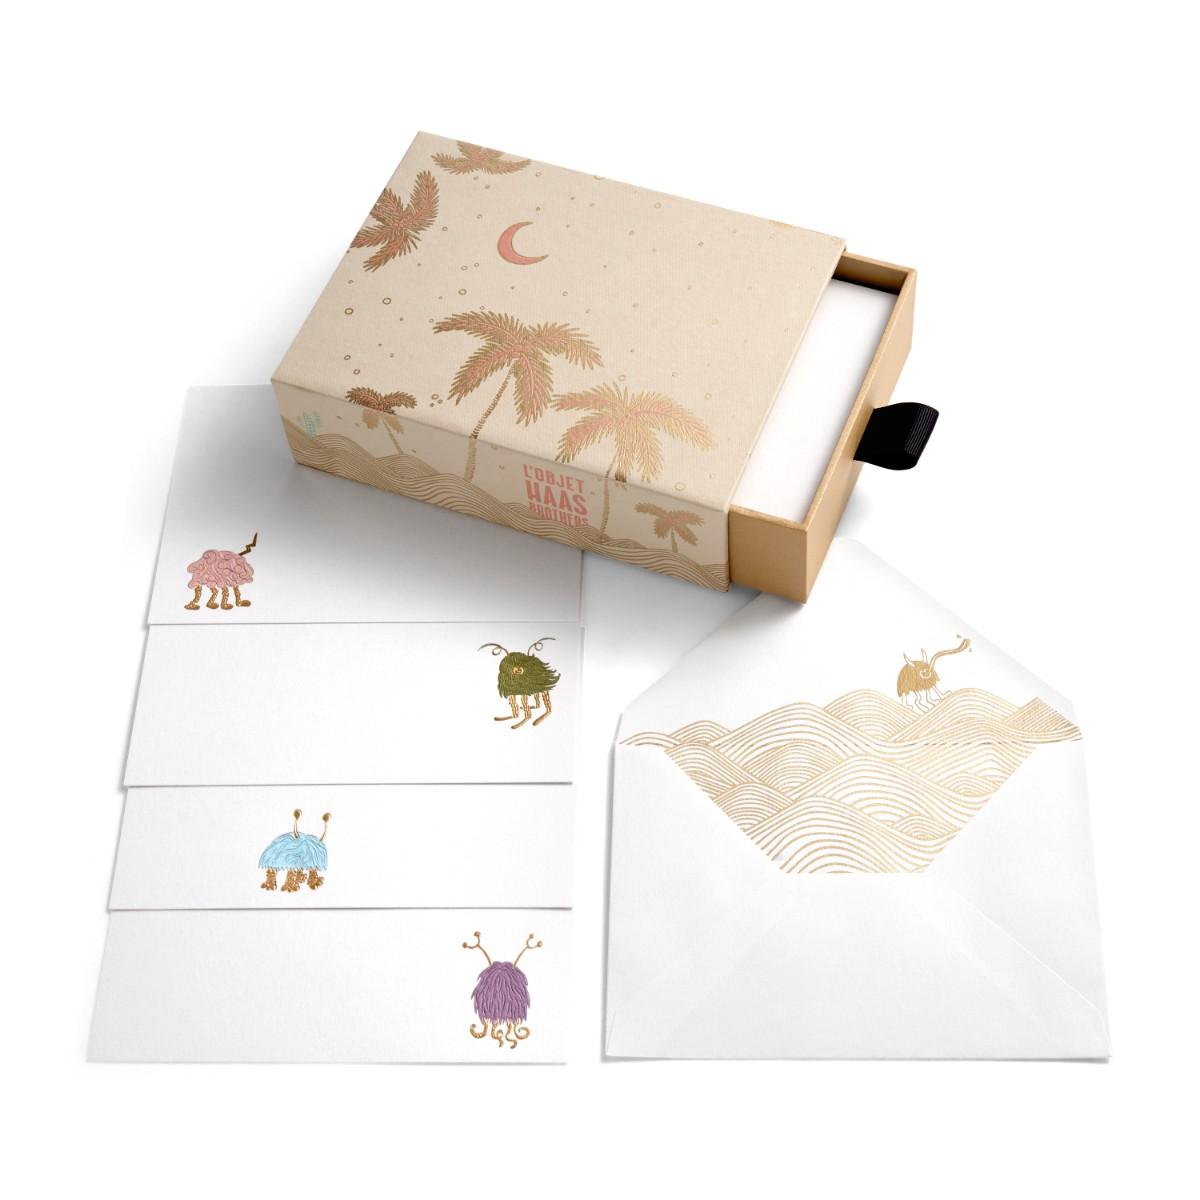 Haas Stationary Box